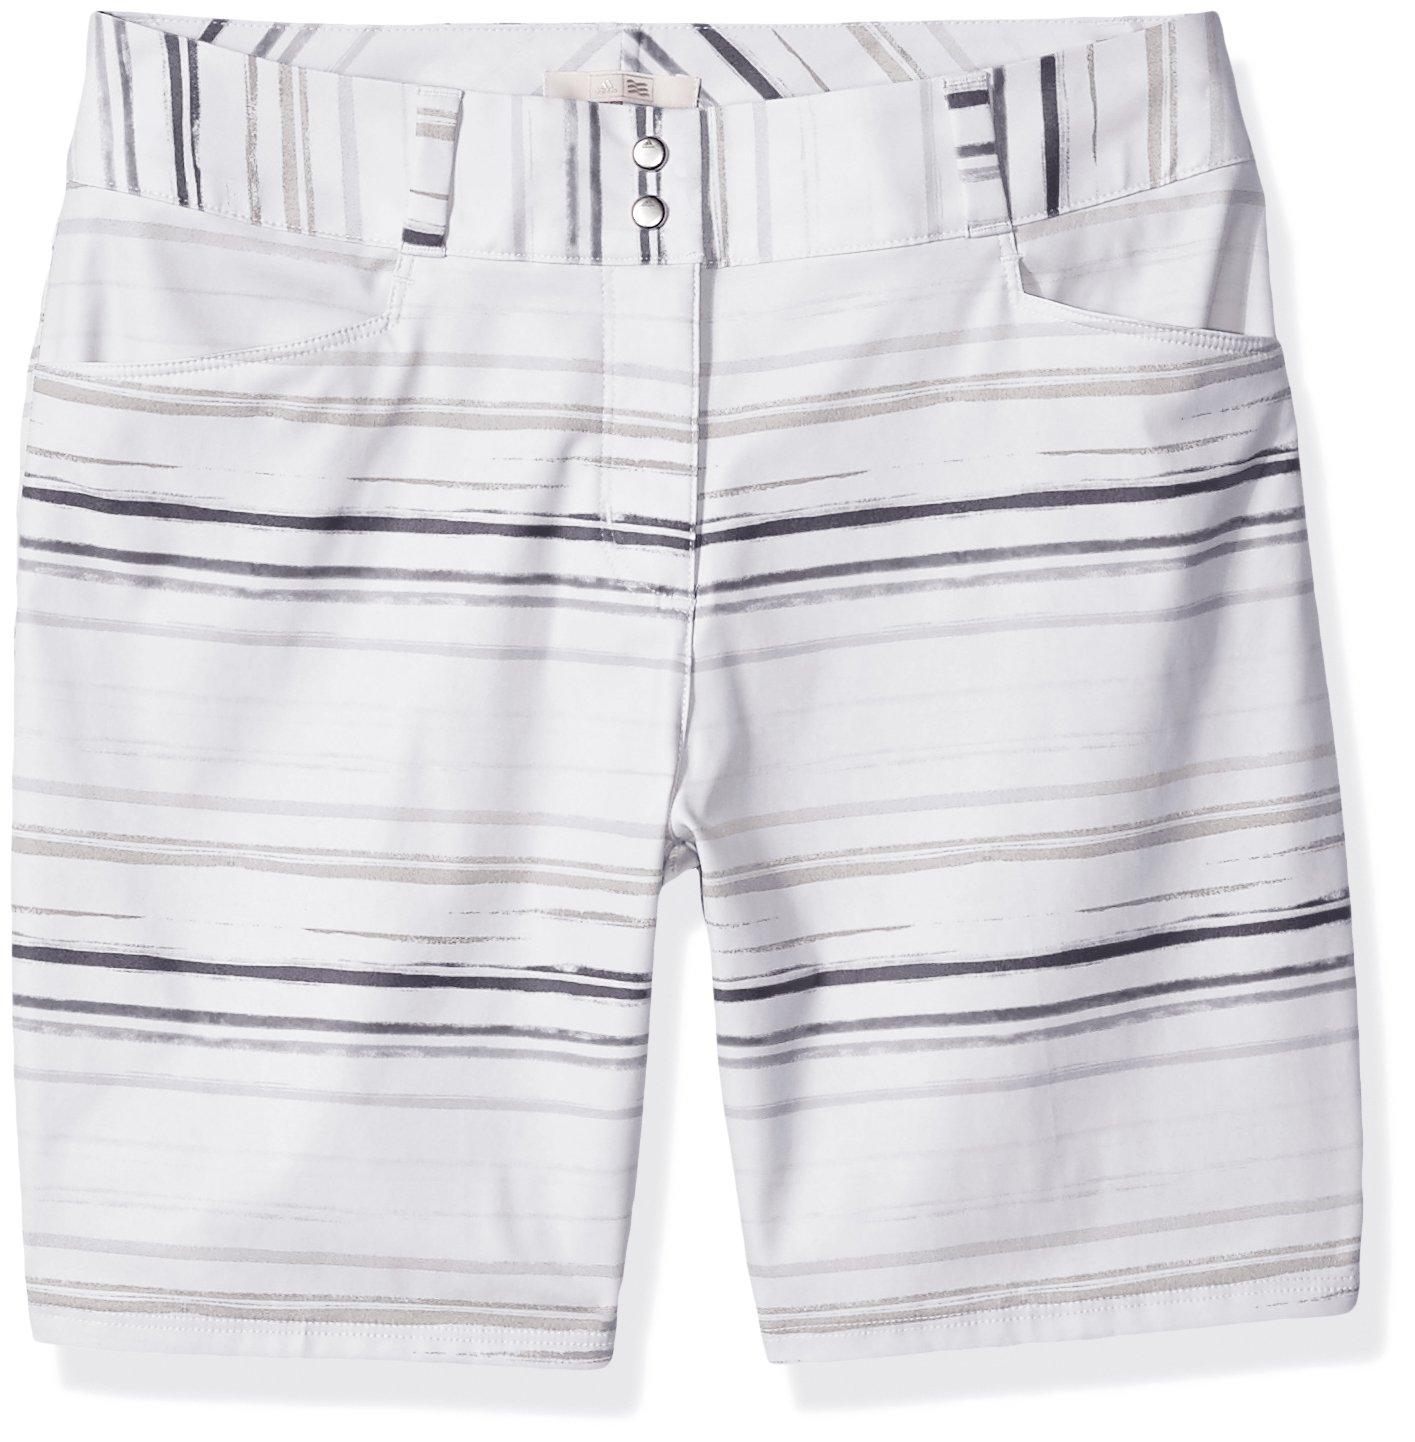 adidas Golf Women's Essentials Painted Stripe Shorts, White, Size 2